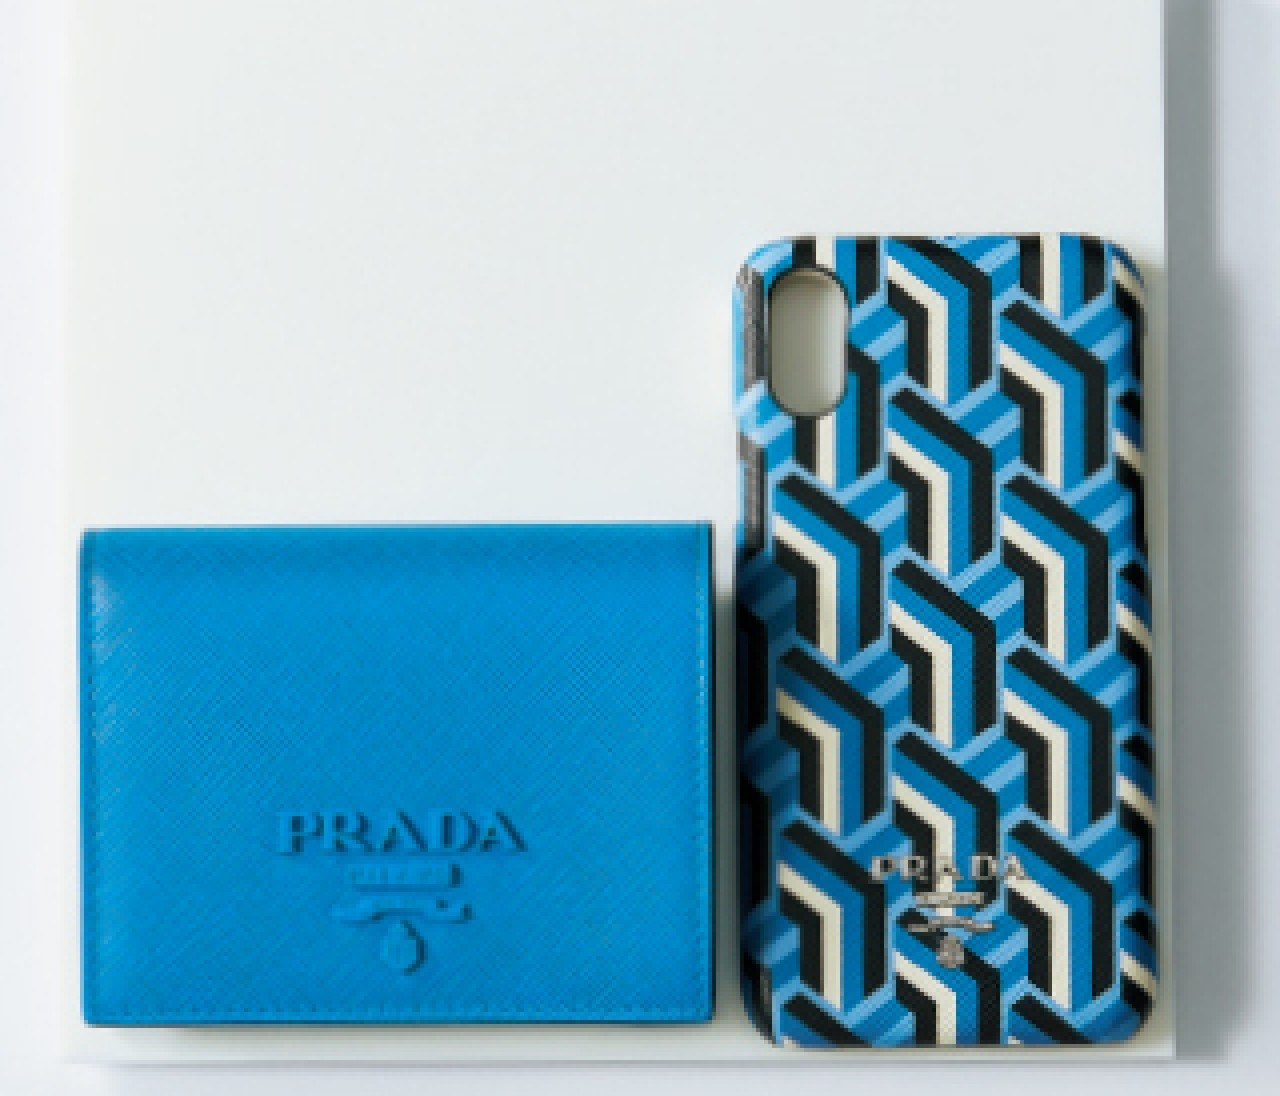 【PRADA】夏に最適なブルーの小物がトップメゾンから登場! スモールレザーグッズ⑥